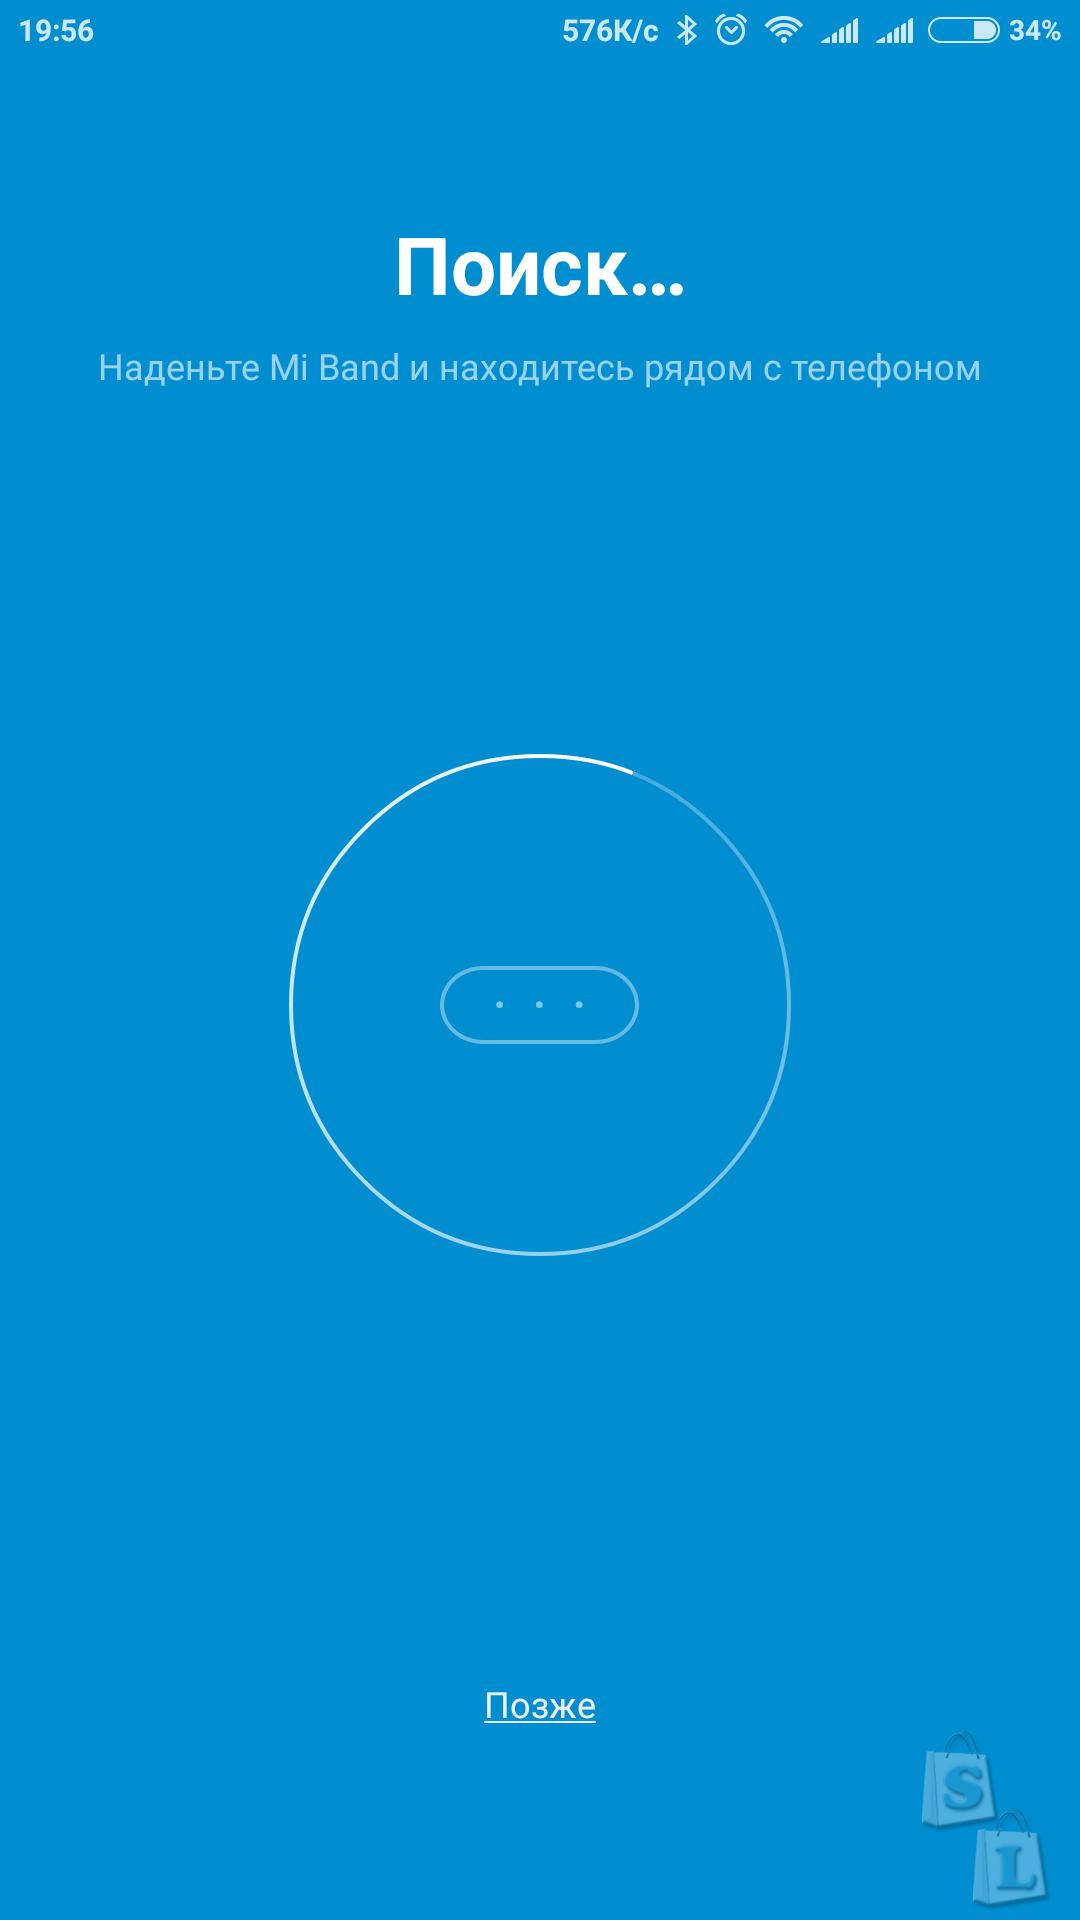 EverBuying: Обзор смартбраслета Xiaomi Mi Band 1S Smart Heart Rate